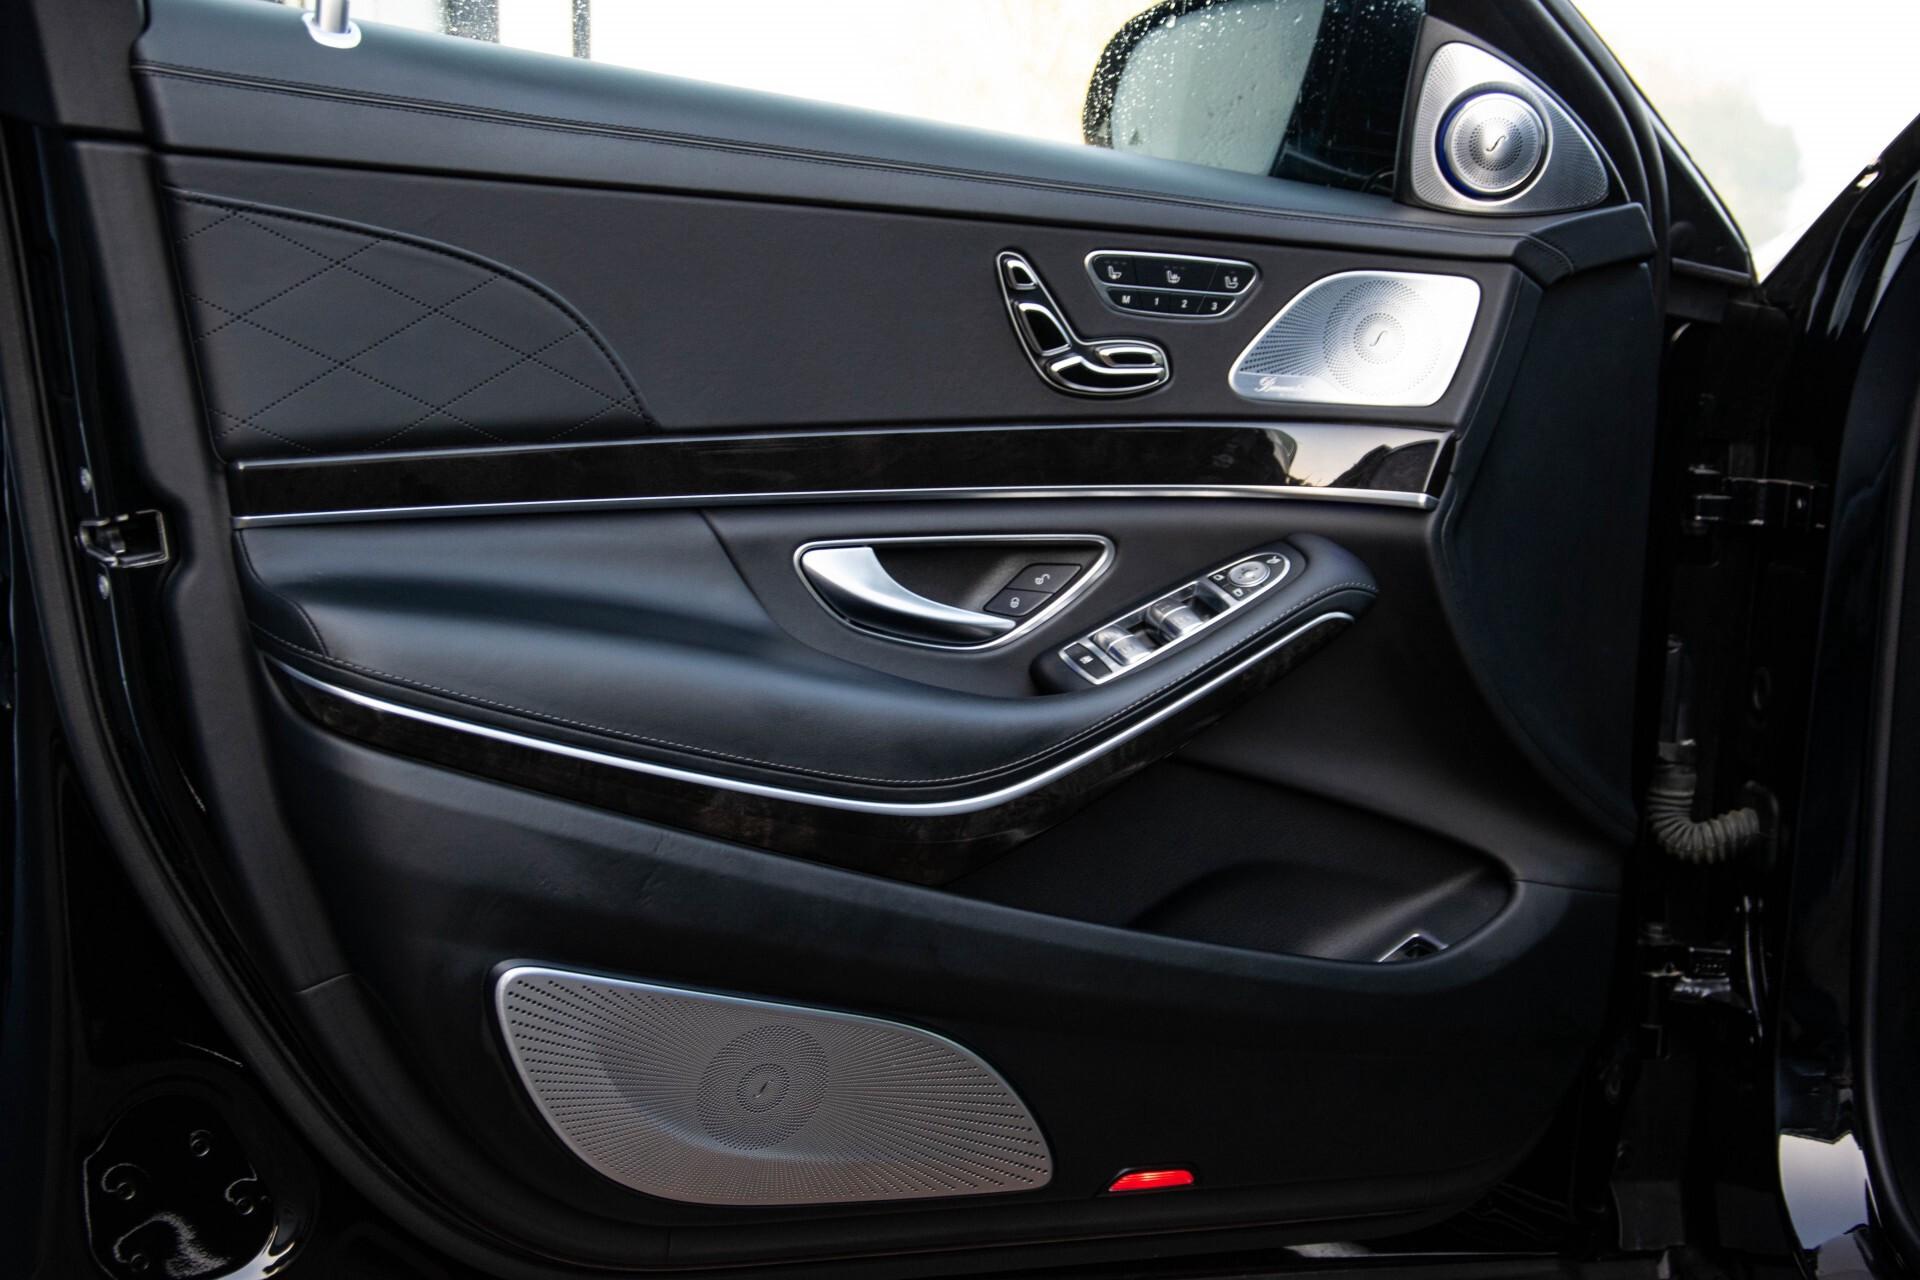 Mercedes-Benz S-Klasse 63 AMG Exclusive/Burmester High-End/Driverspack Aut7 Foto 18